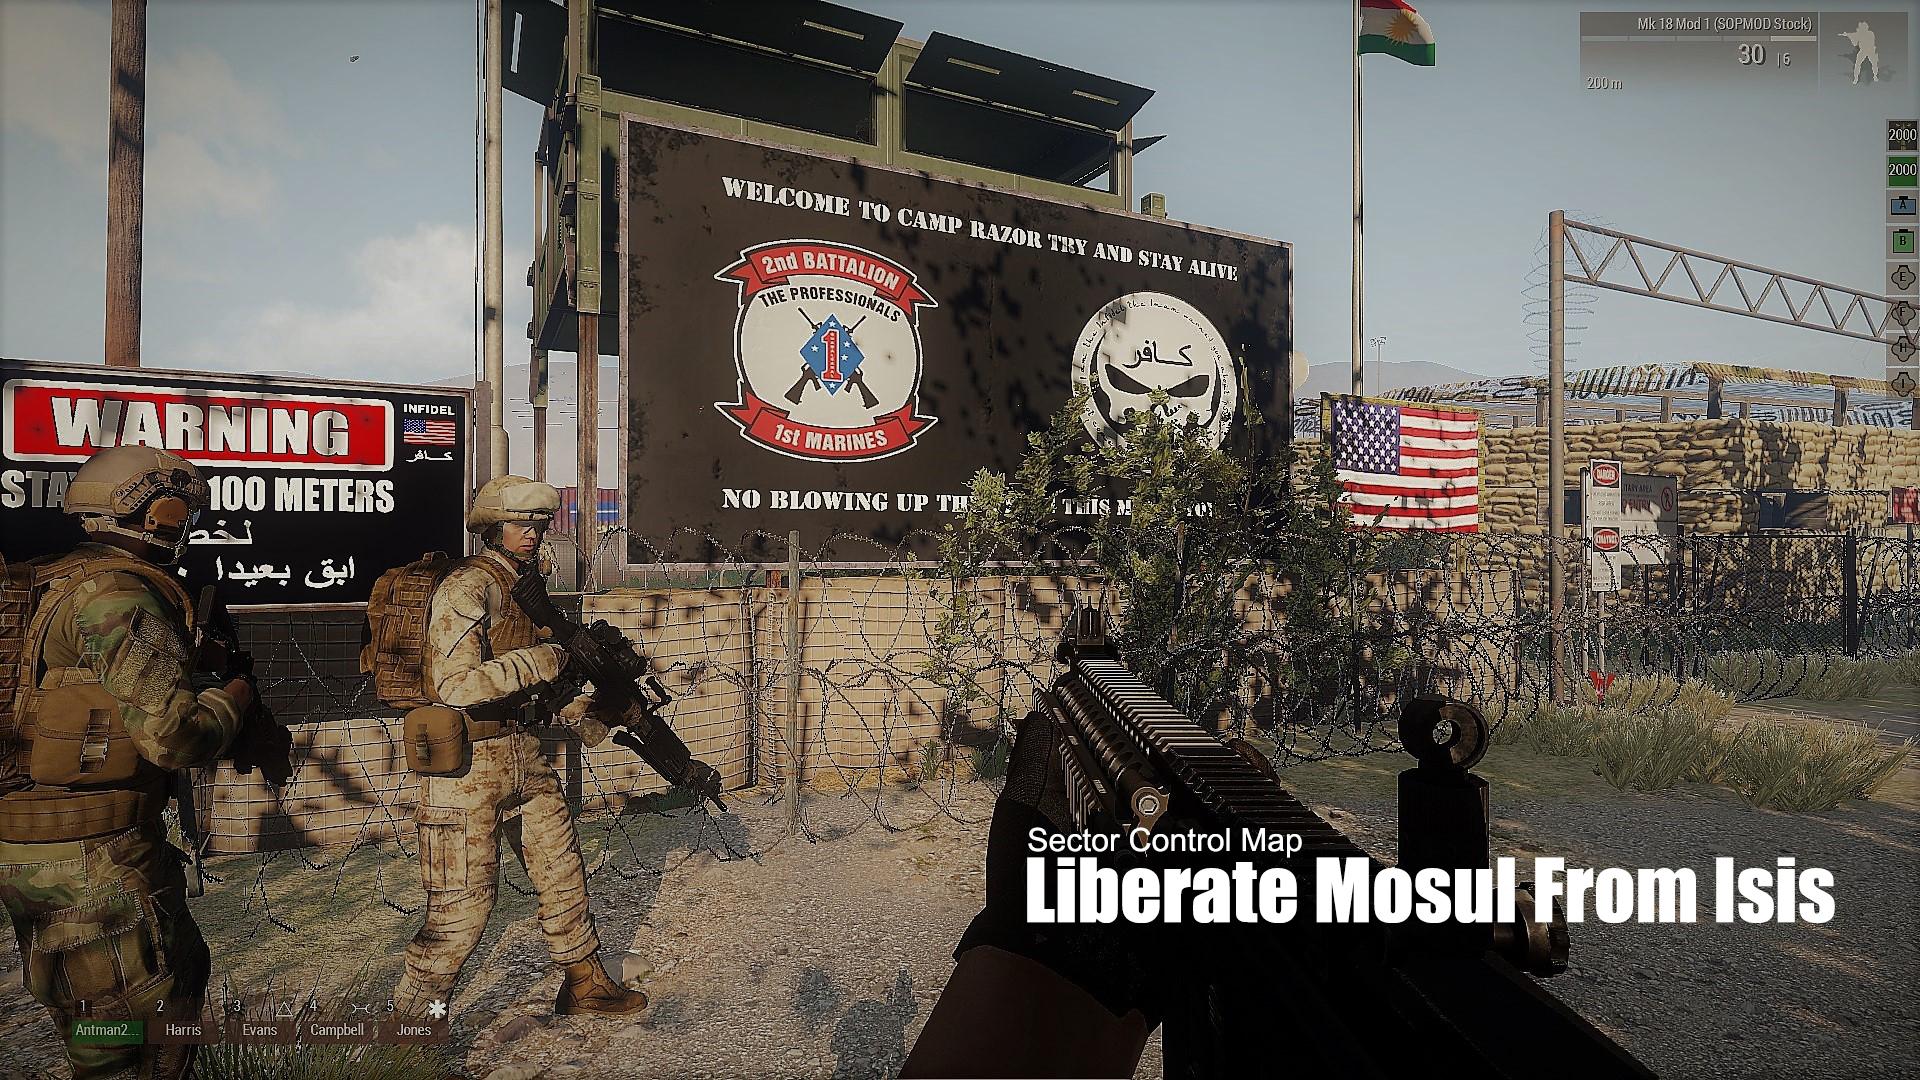 MSOF Liberate Mosul